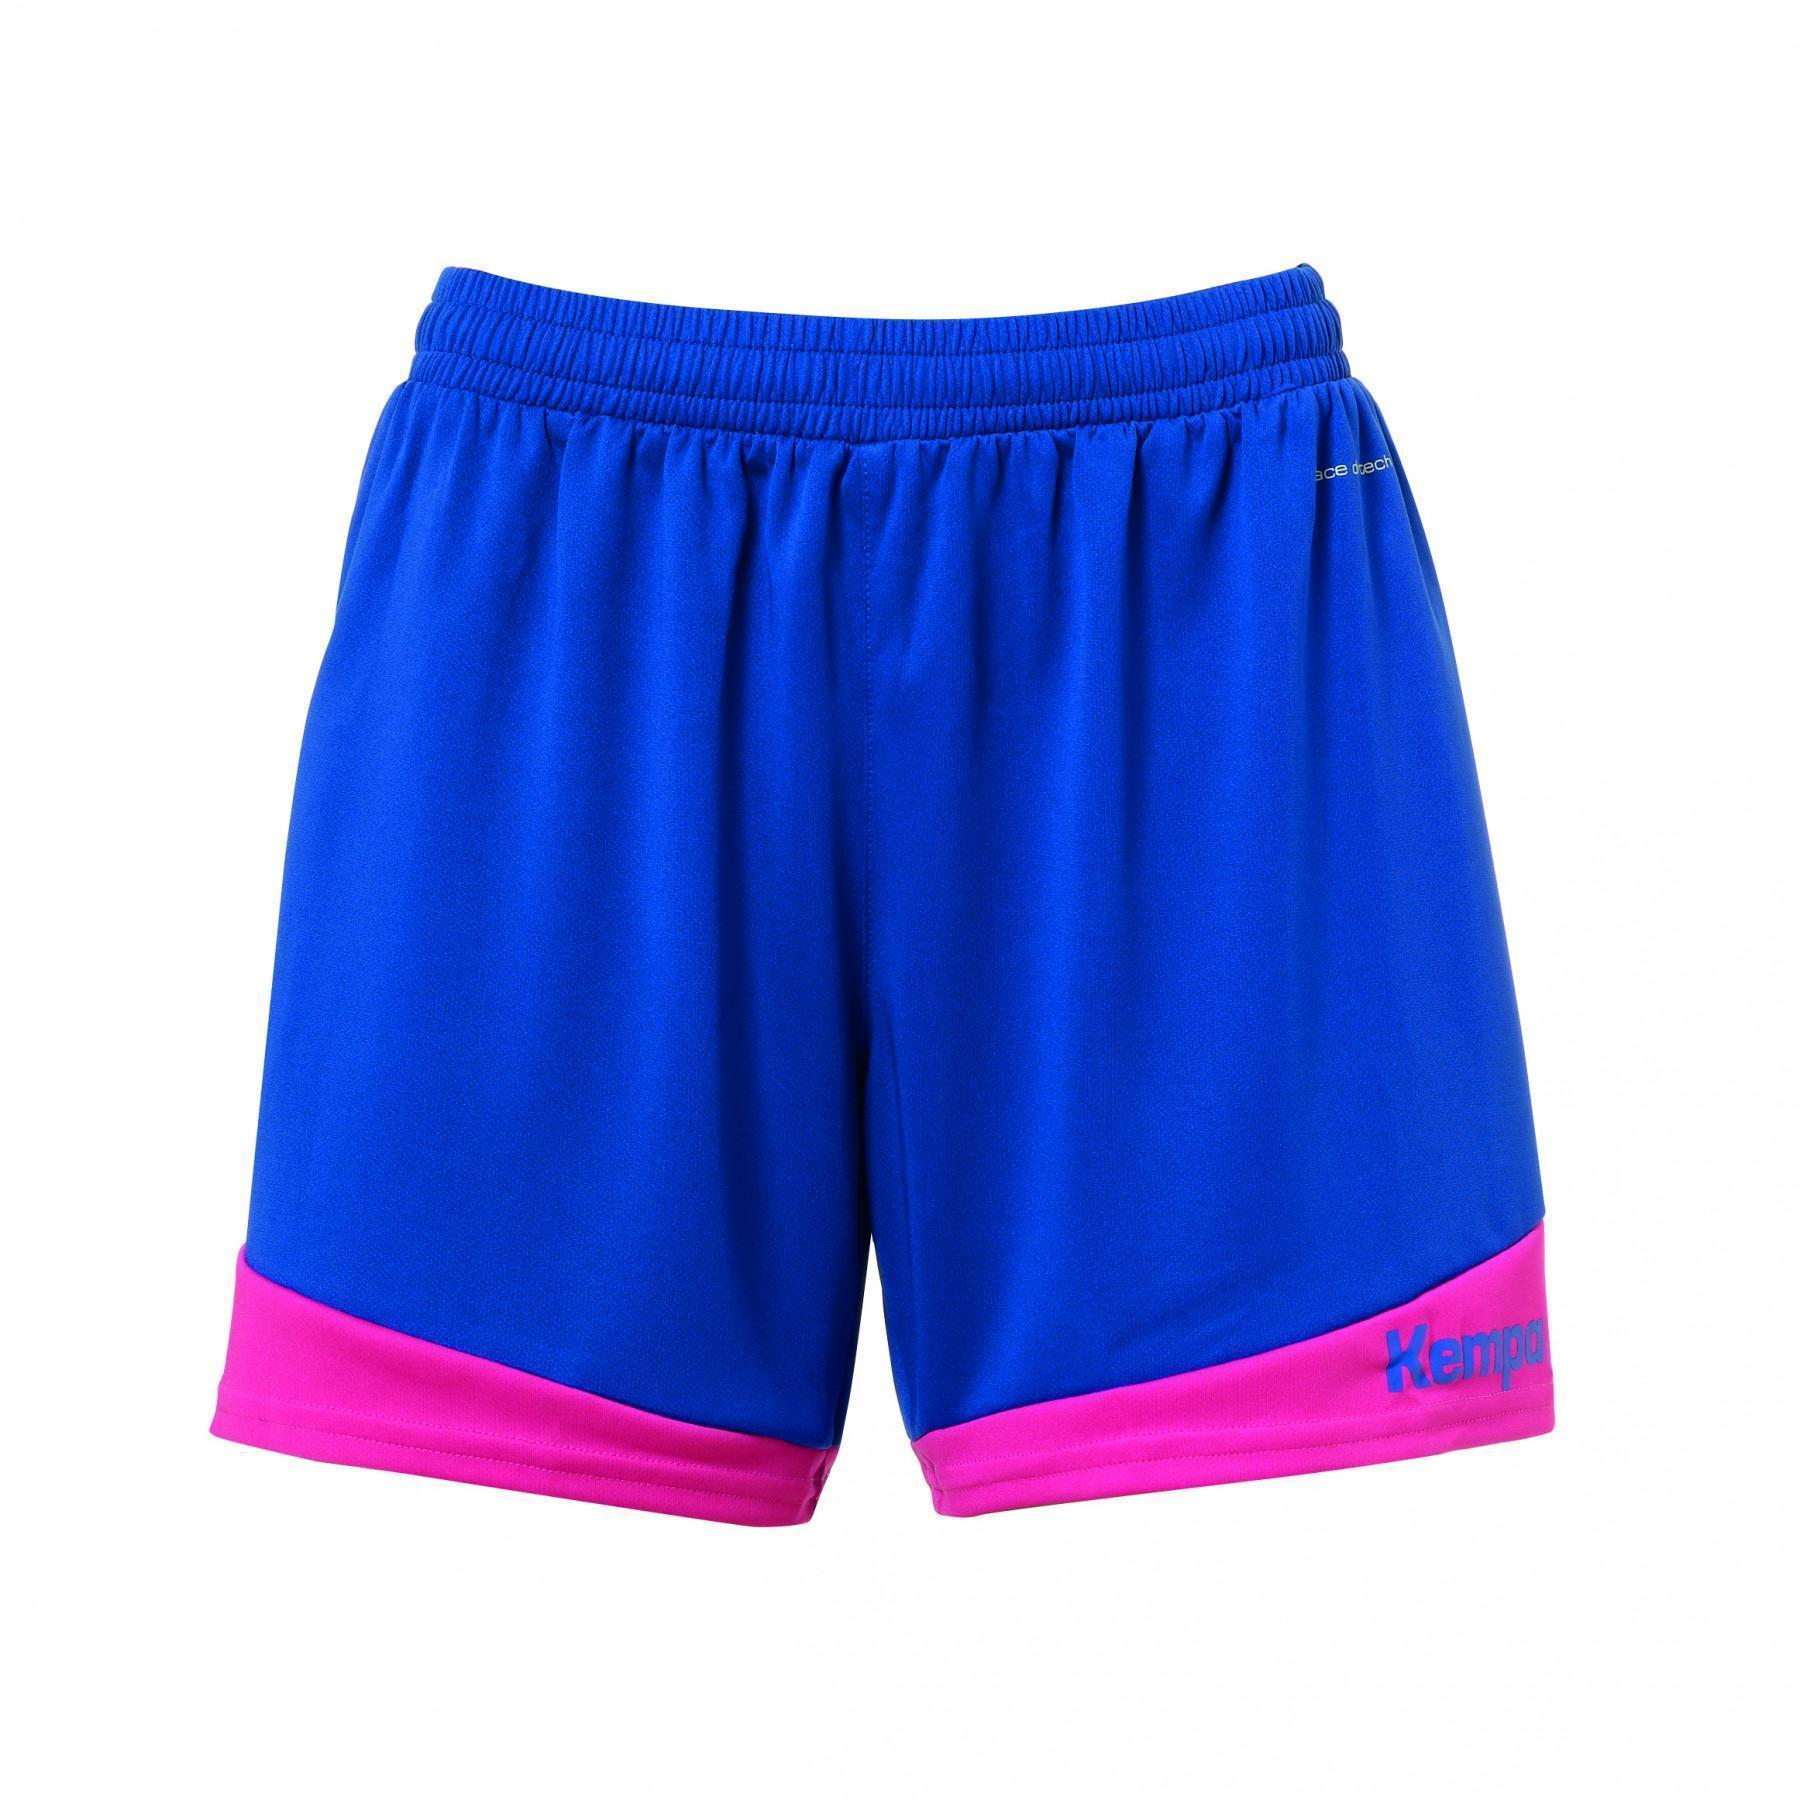 Woman Shorts Kempa Emtoion 2.0